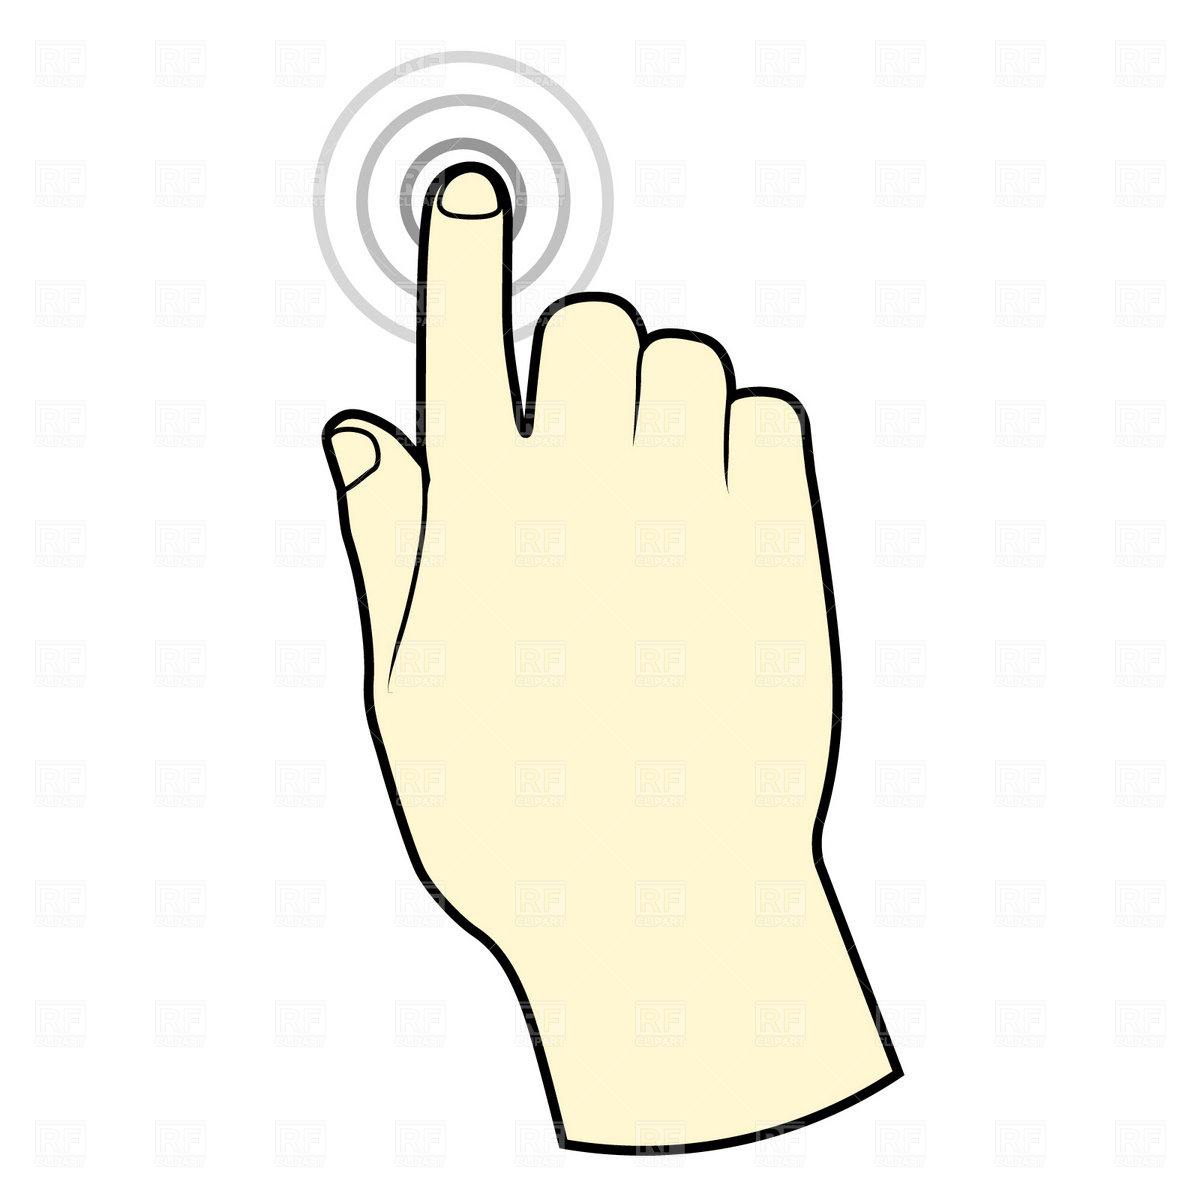 1200x1200 Clip Art Sense Of Touch Clipart